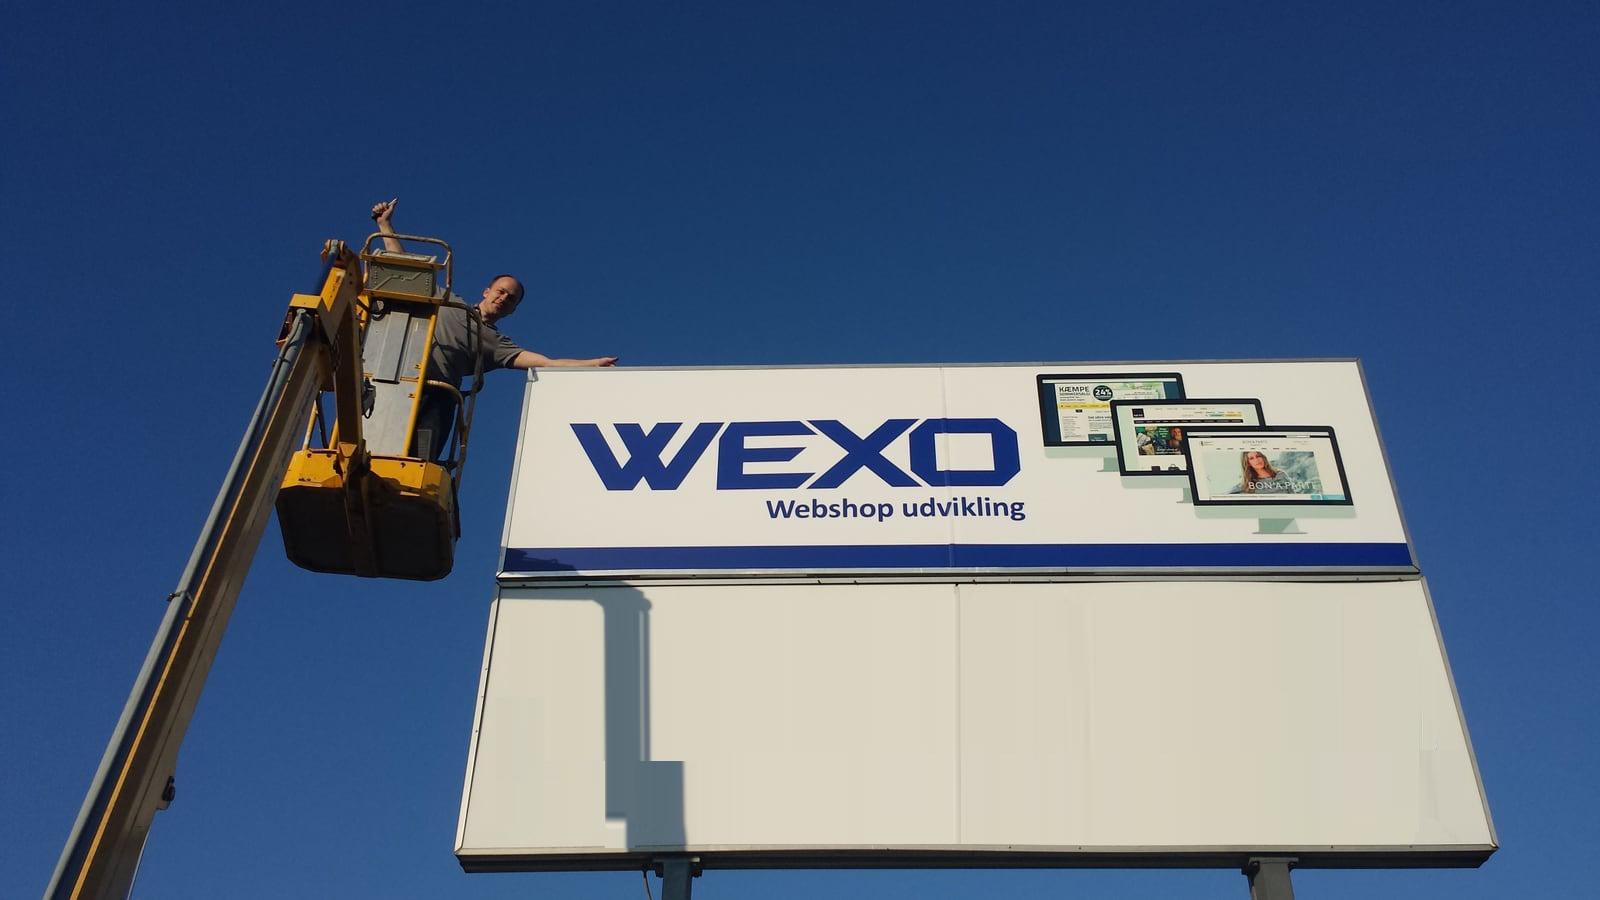 WEXO firmaarrangementer